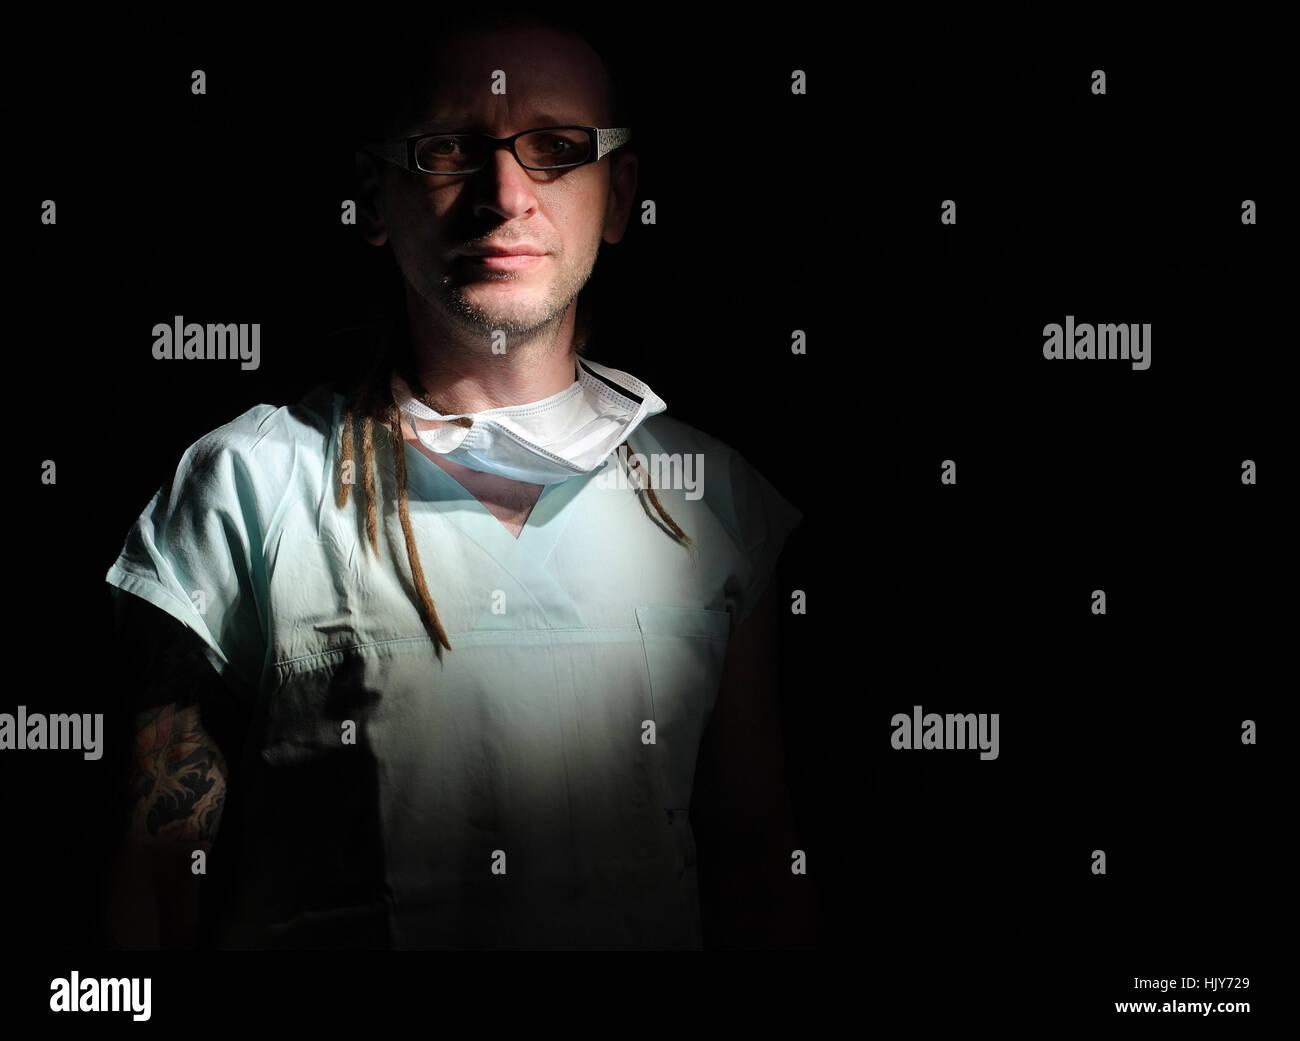 Portrait of  male nurse ICU  with tattoo and dreadlocks on black background - Stock Image